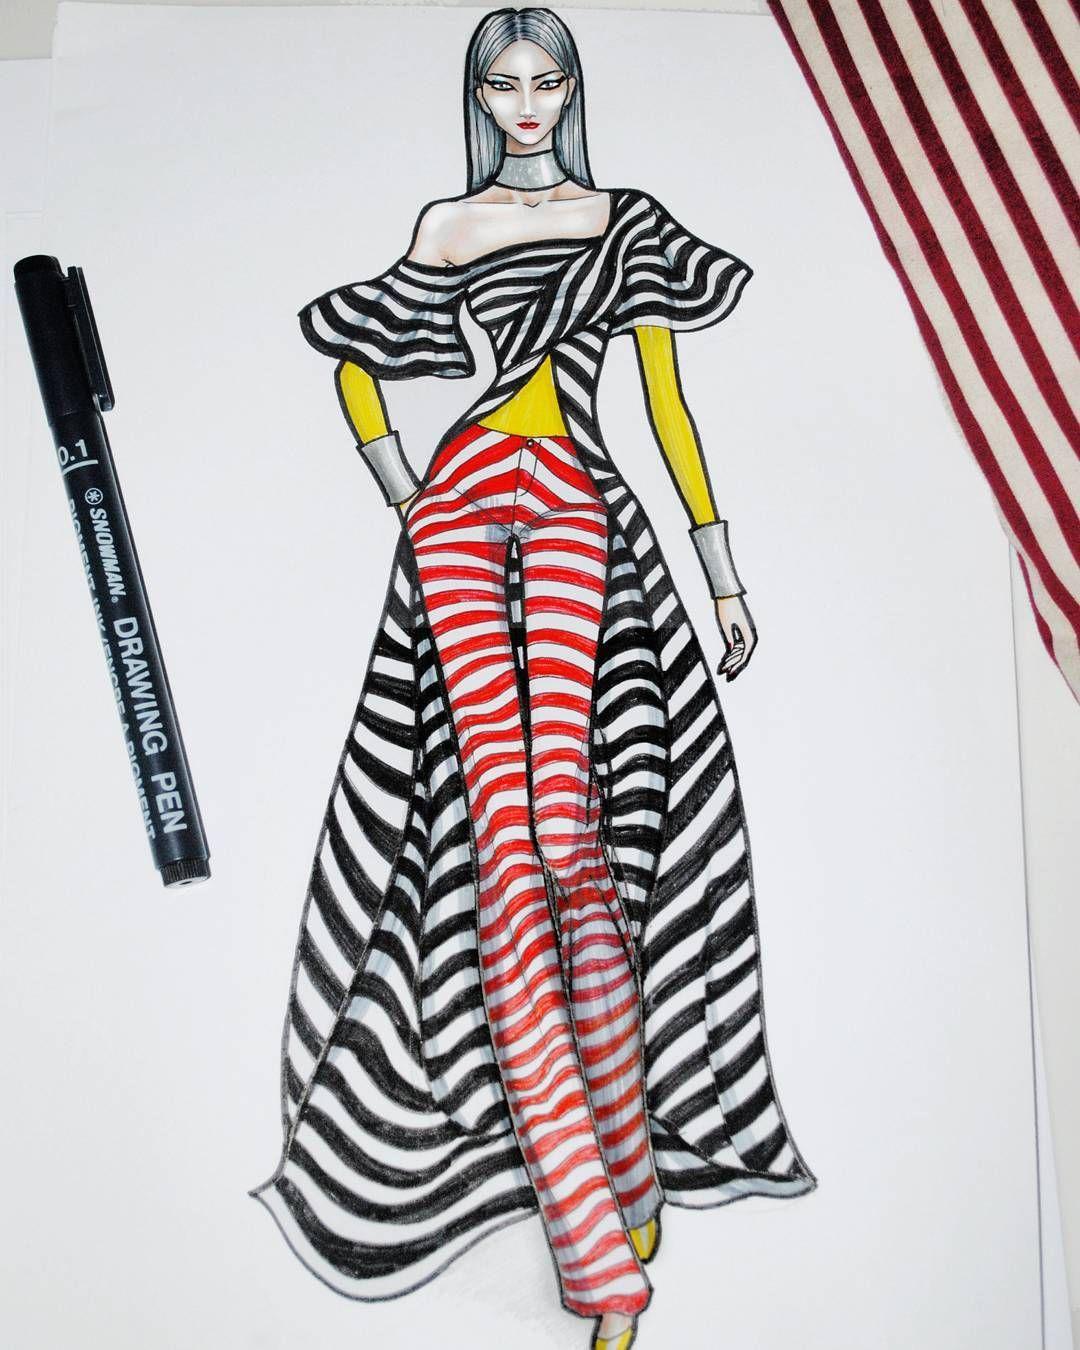 Fashion Illustration Fashion Design Sketches Croquis Fashion Illustration Fashion Design